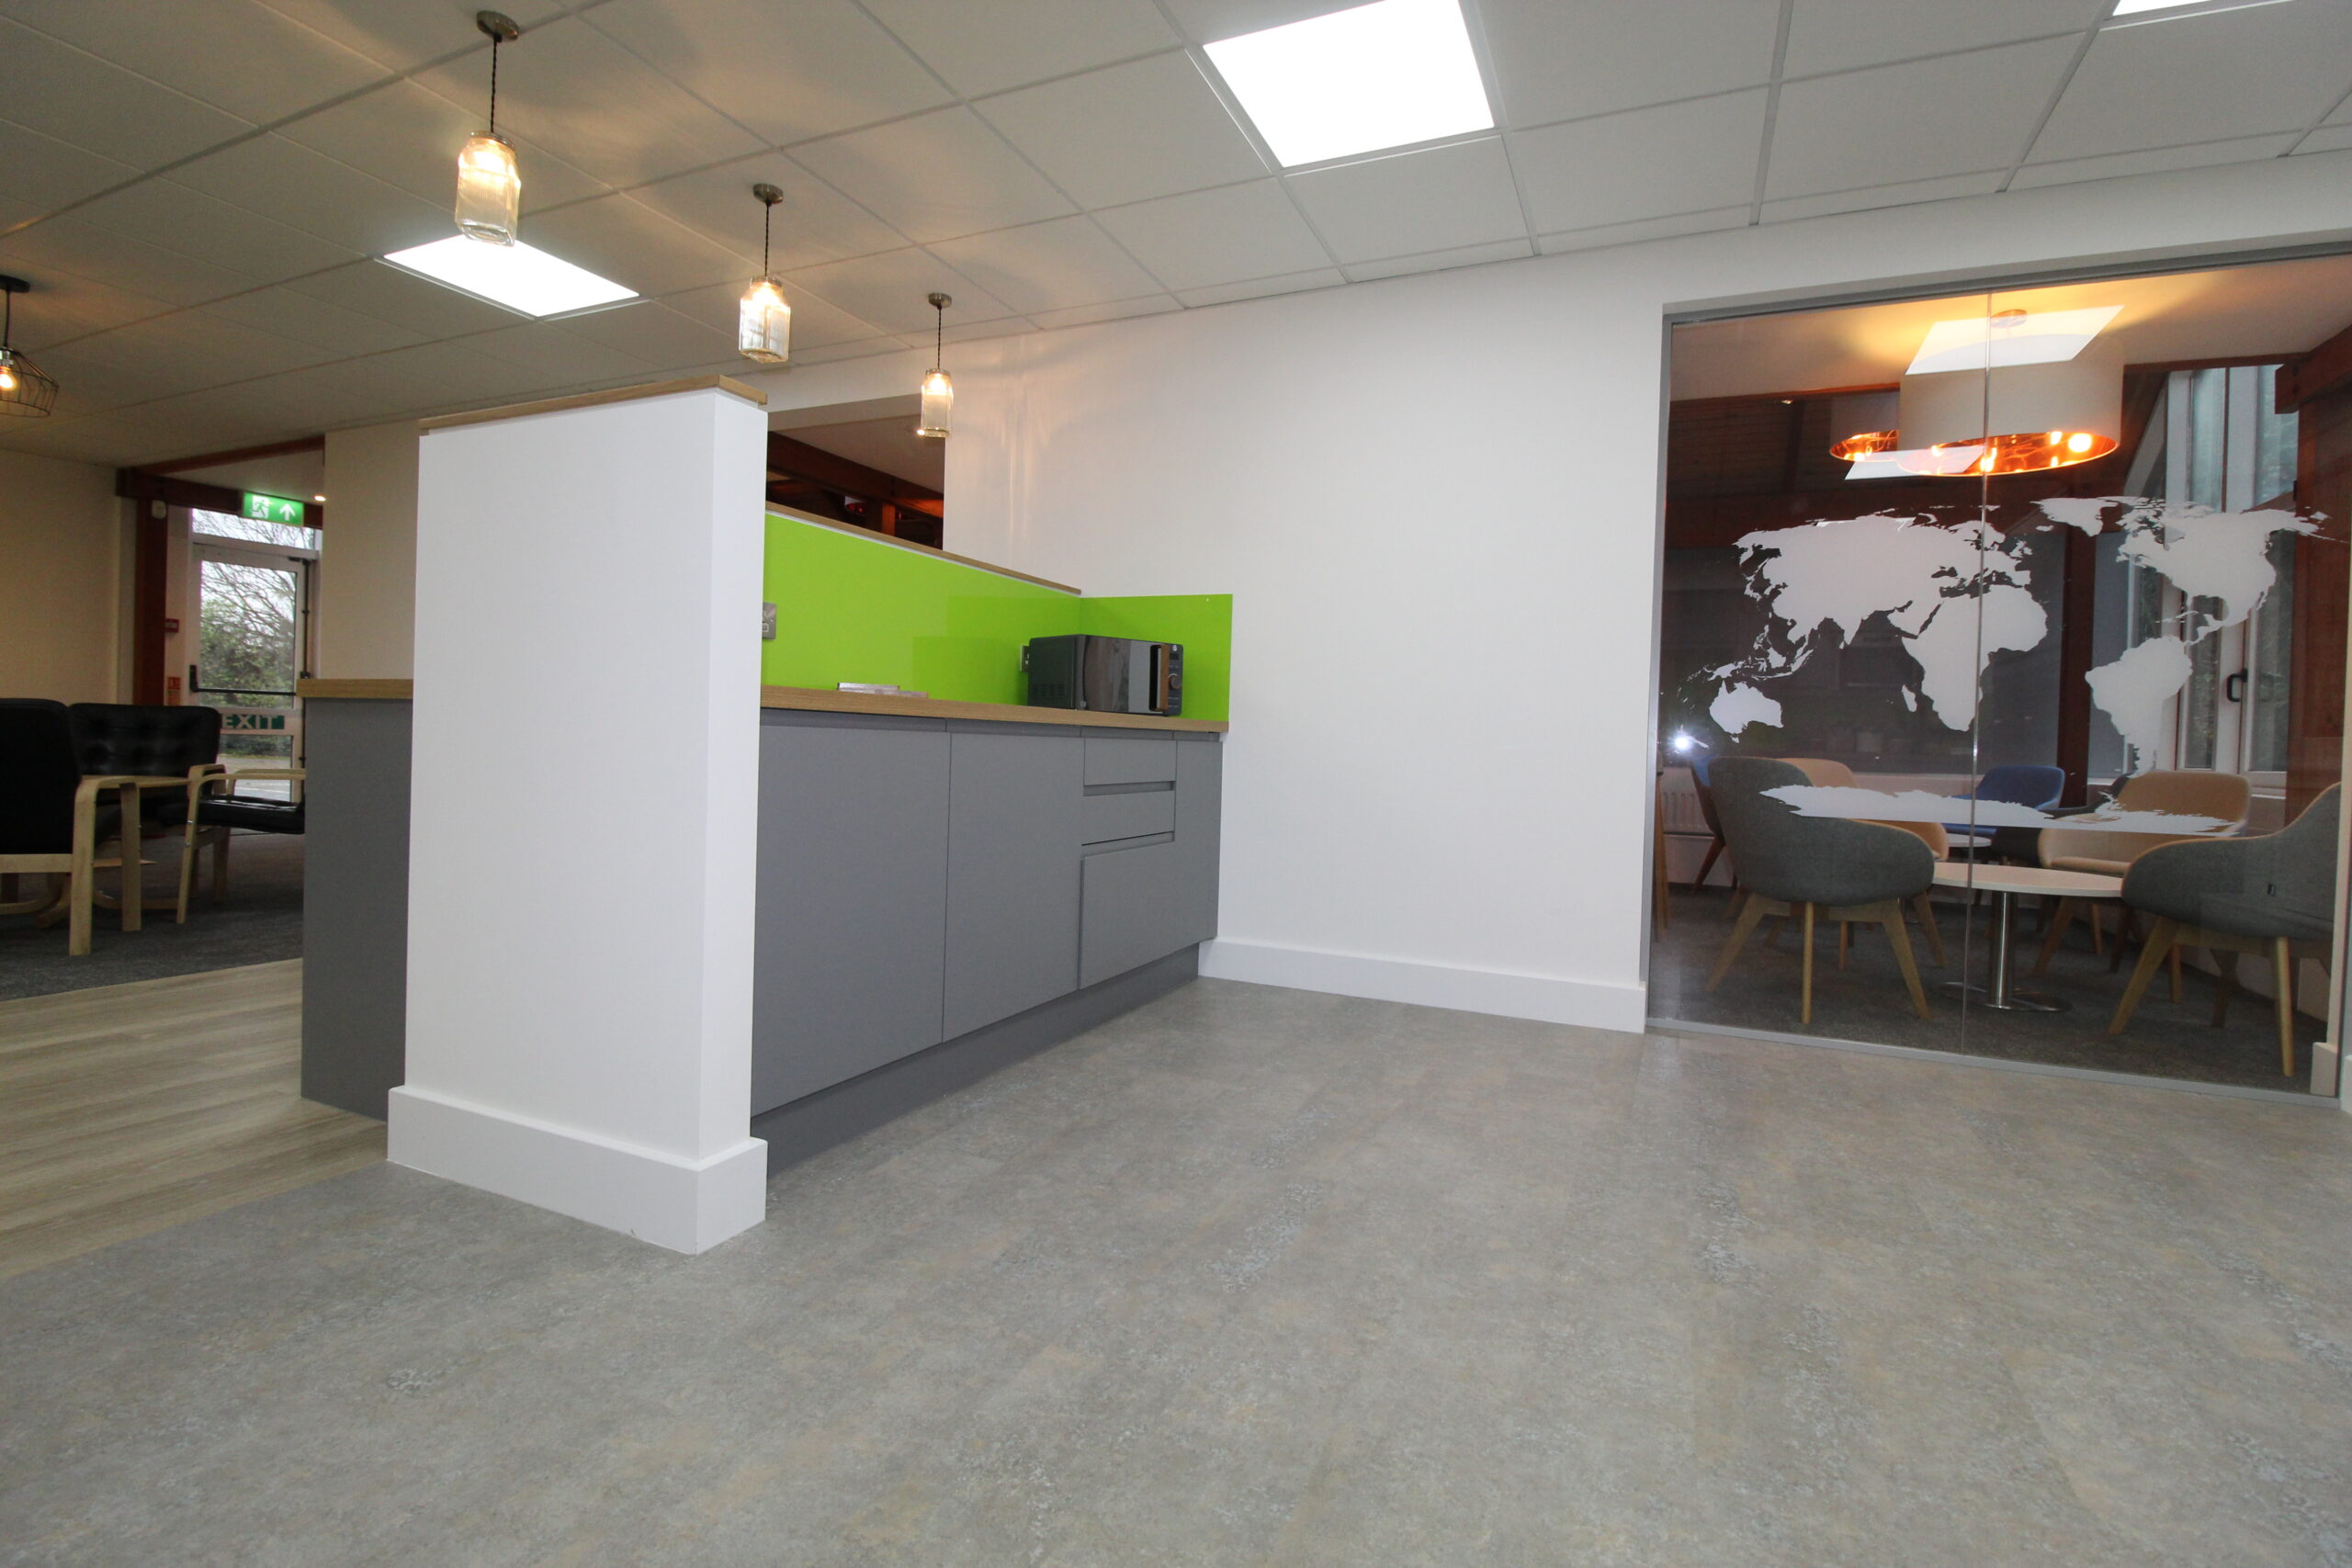 grey kitchen units with lime green splashback, Glass partiton with work map manifestation